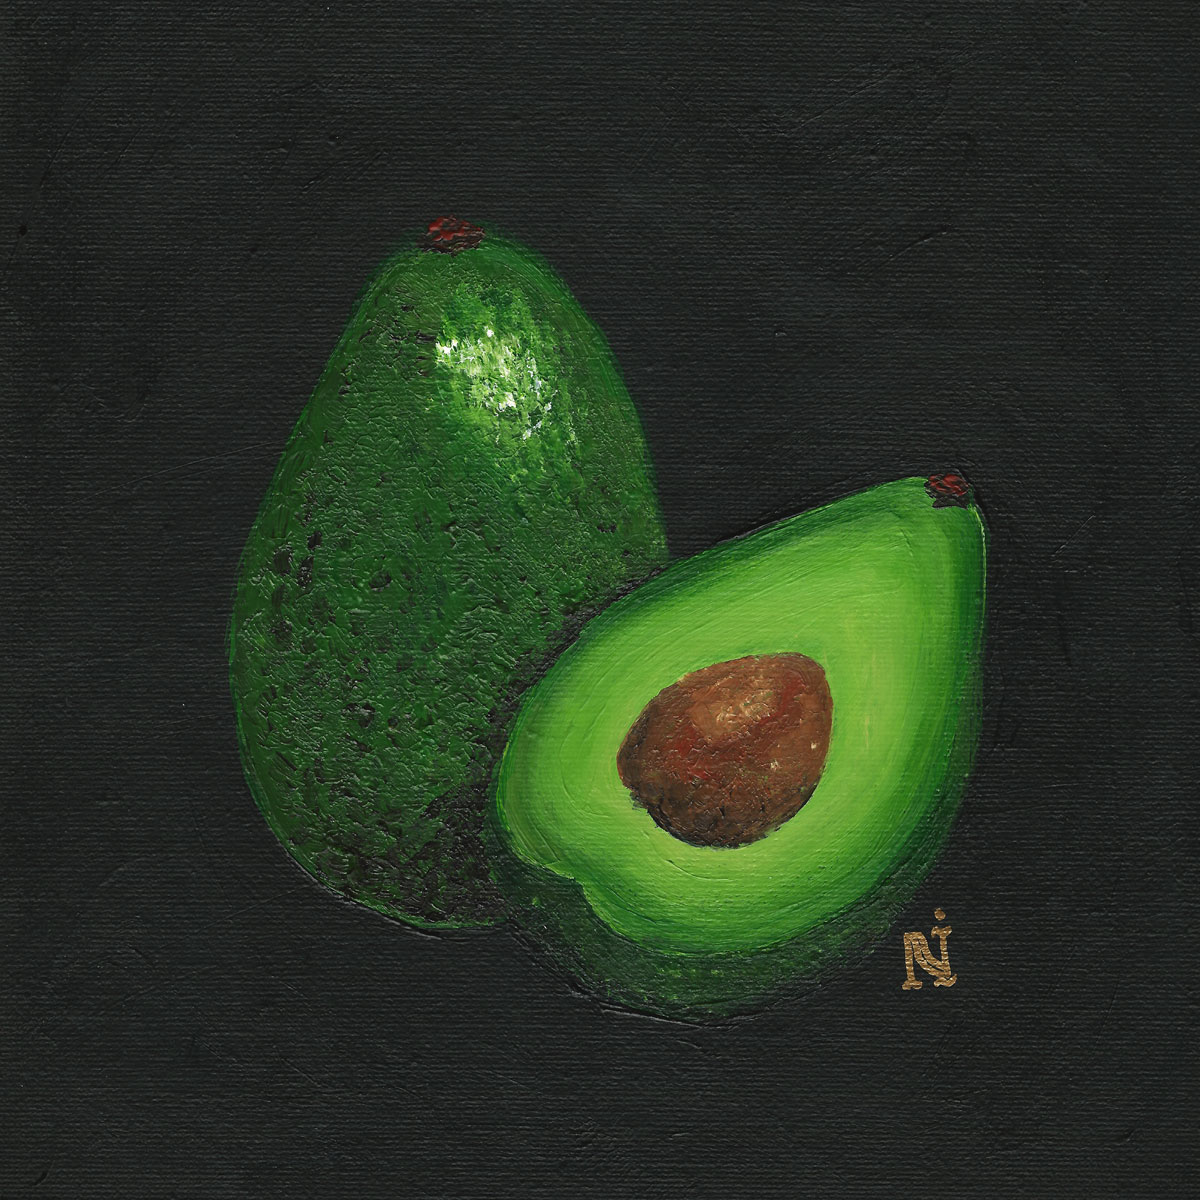 Avocado, 8x8in acrylic on canvas